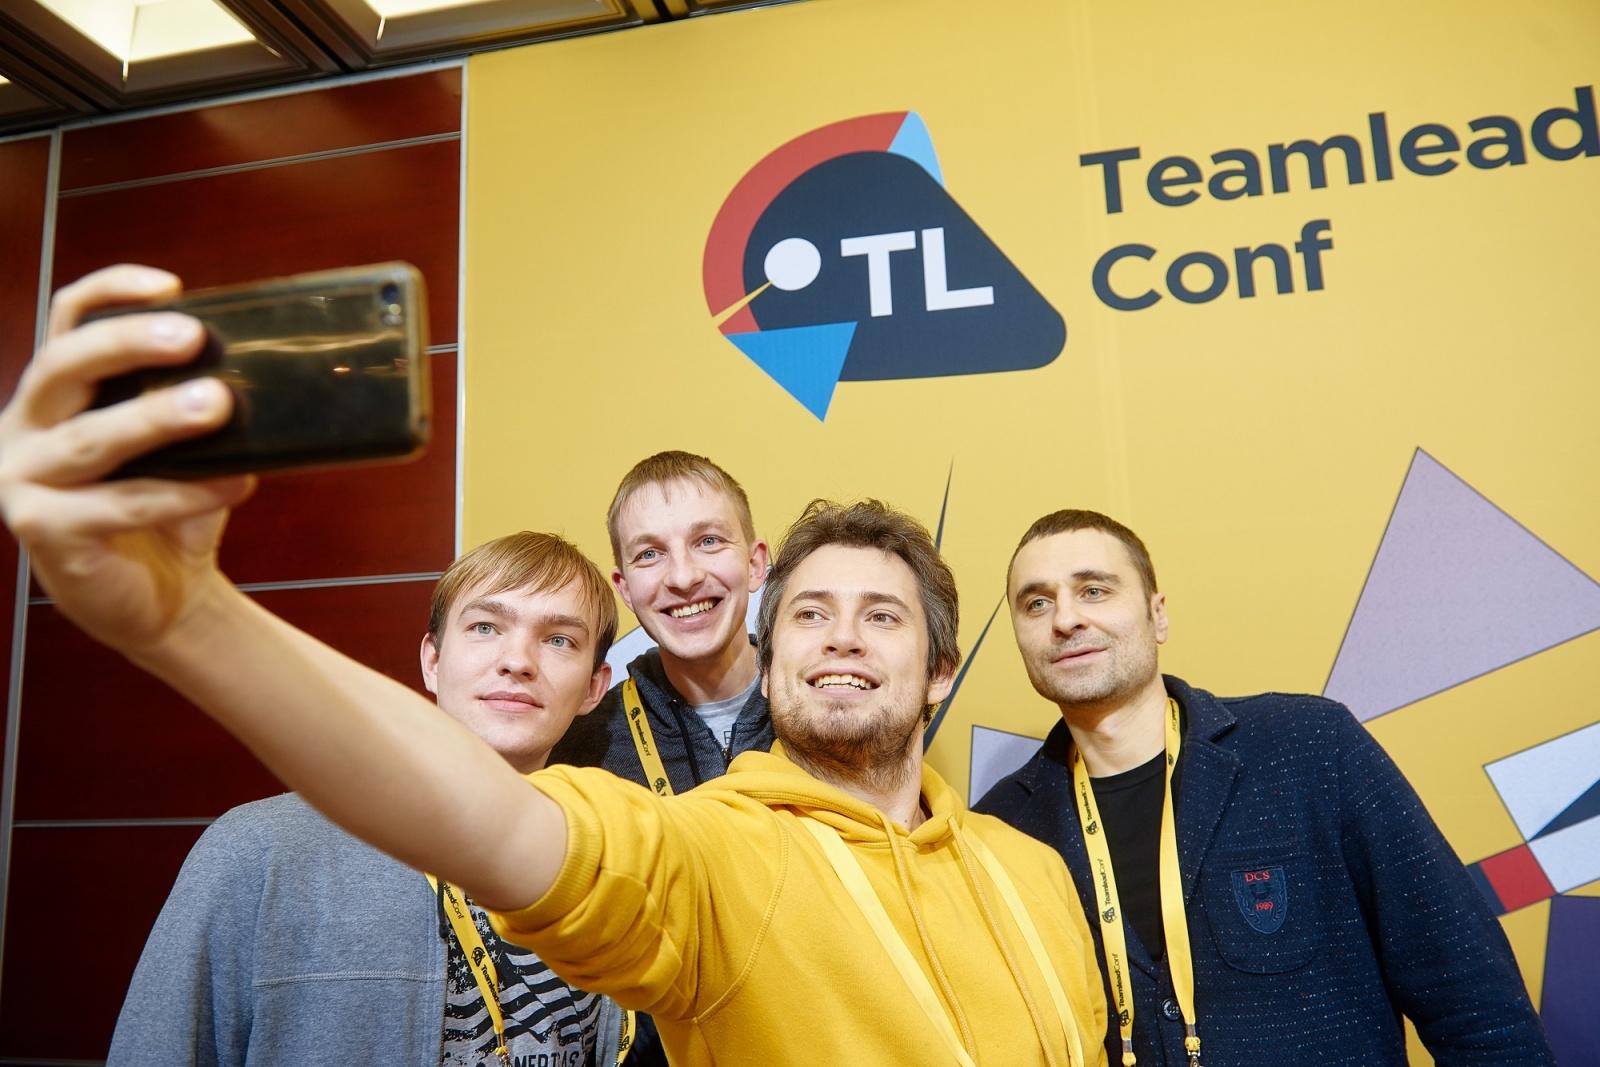 Teamlead Conf: ретроспектива и планы на будущее - 1